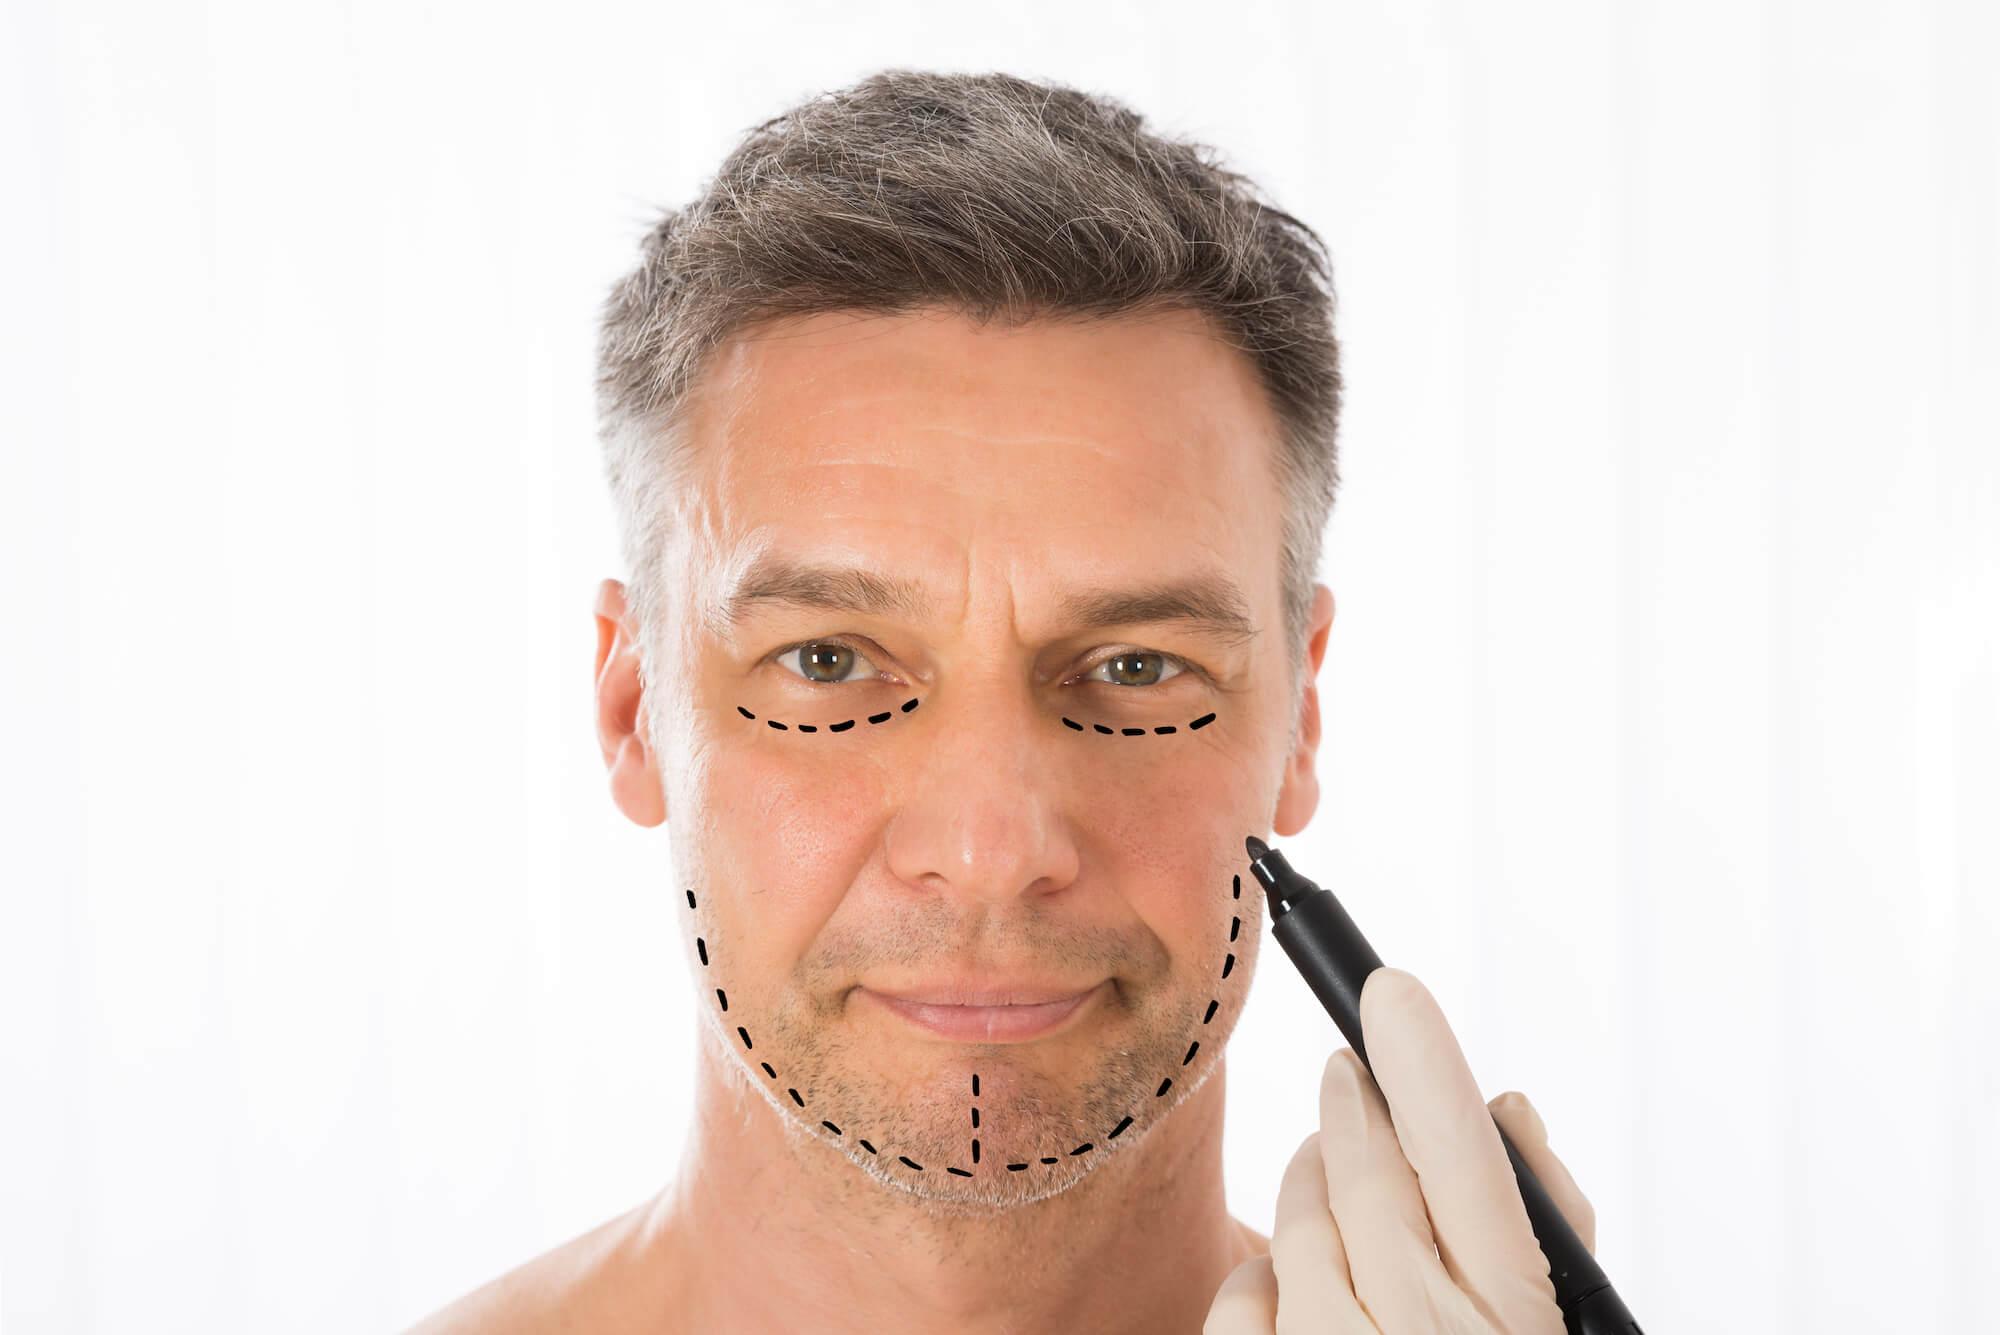 facelift surgery before and after photos plastic surgery atlanta ga